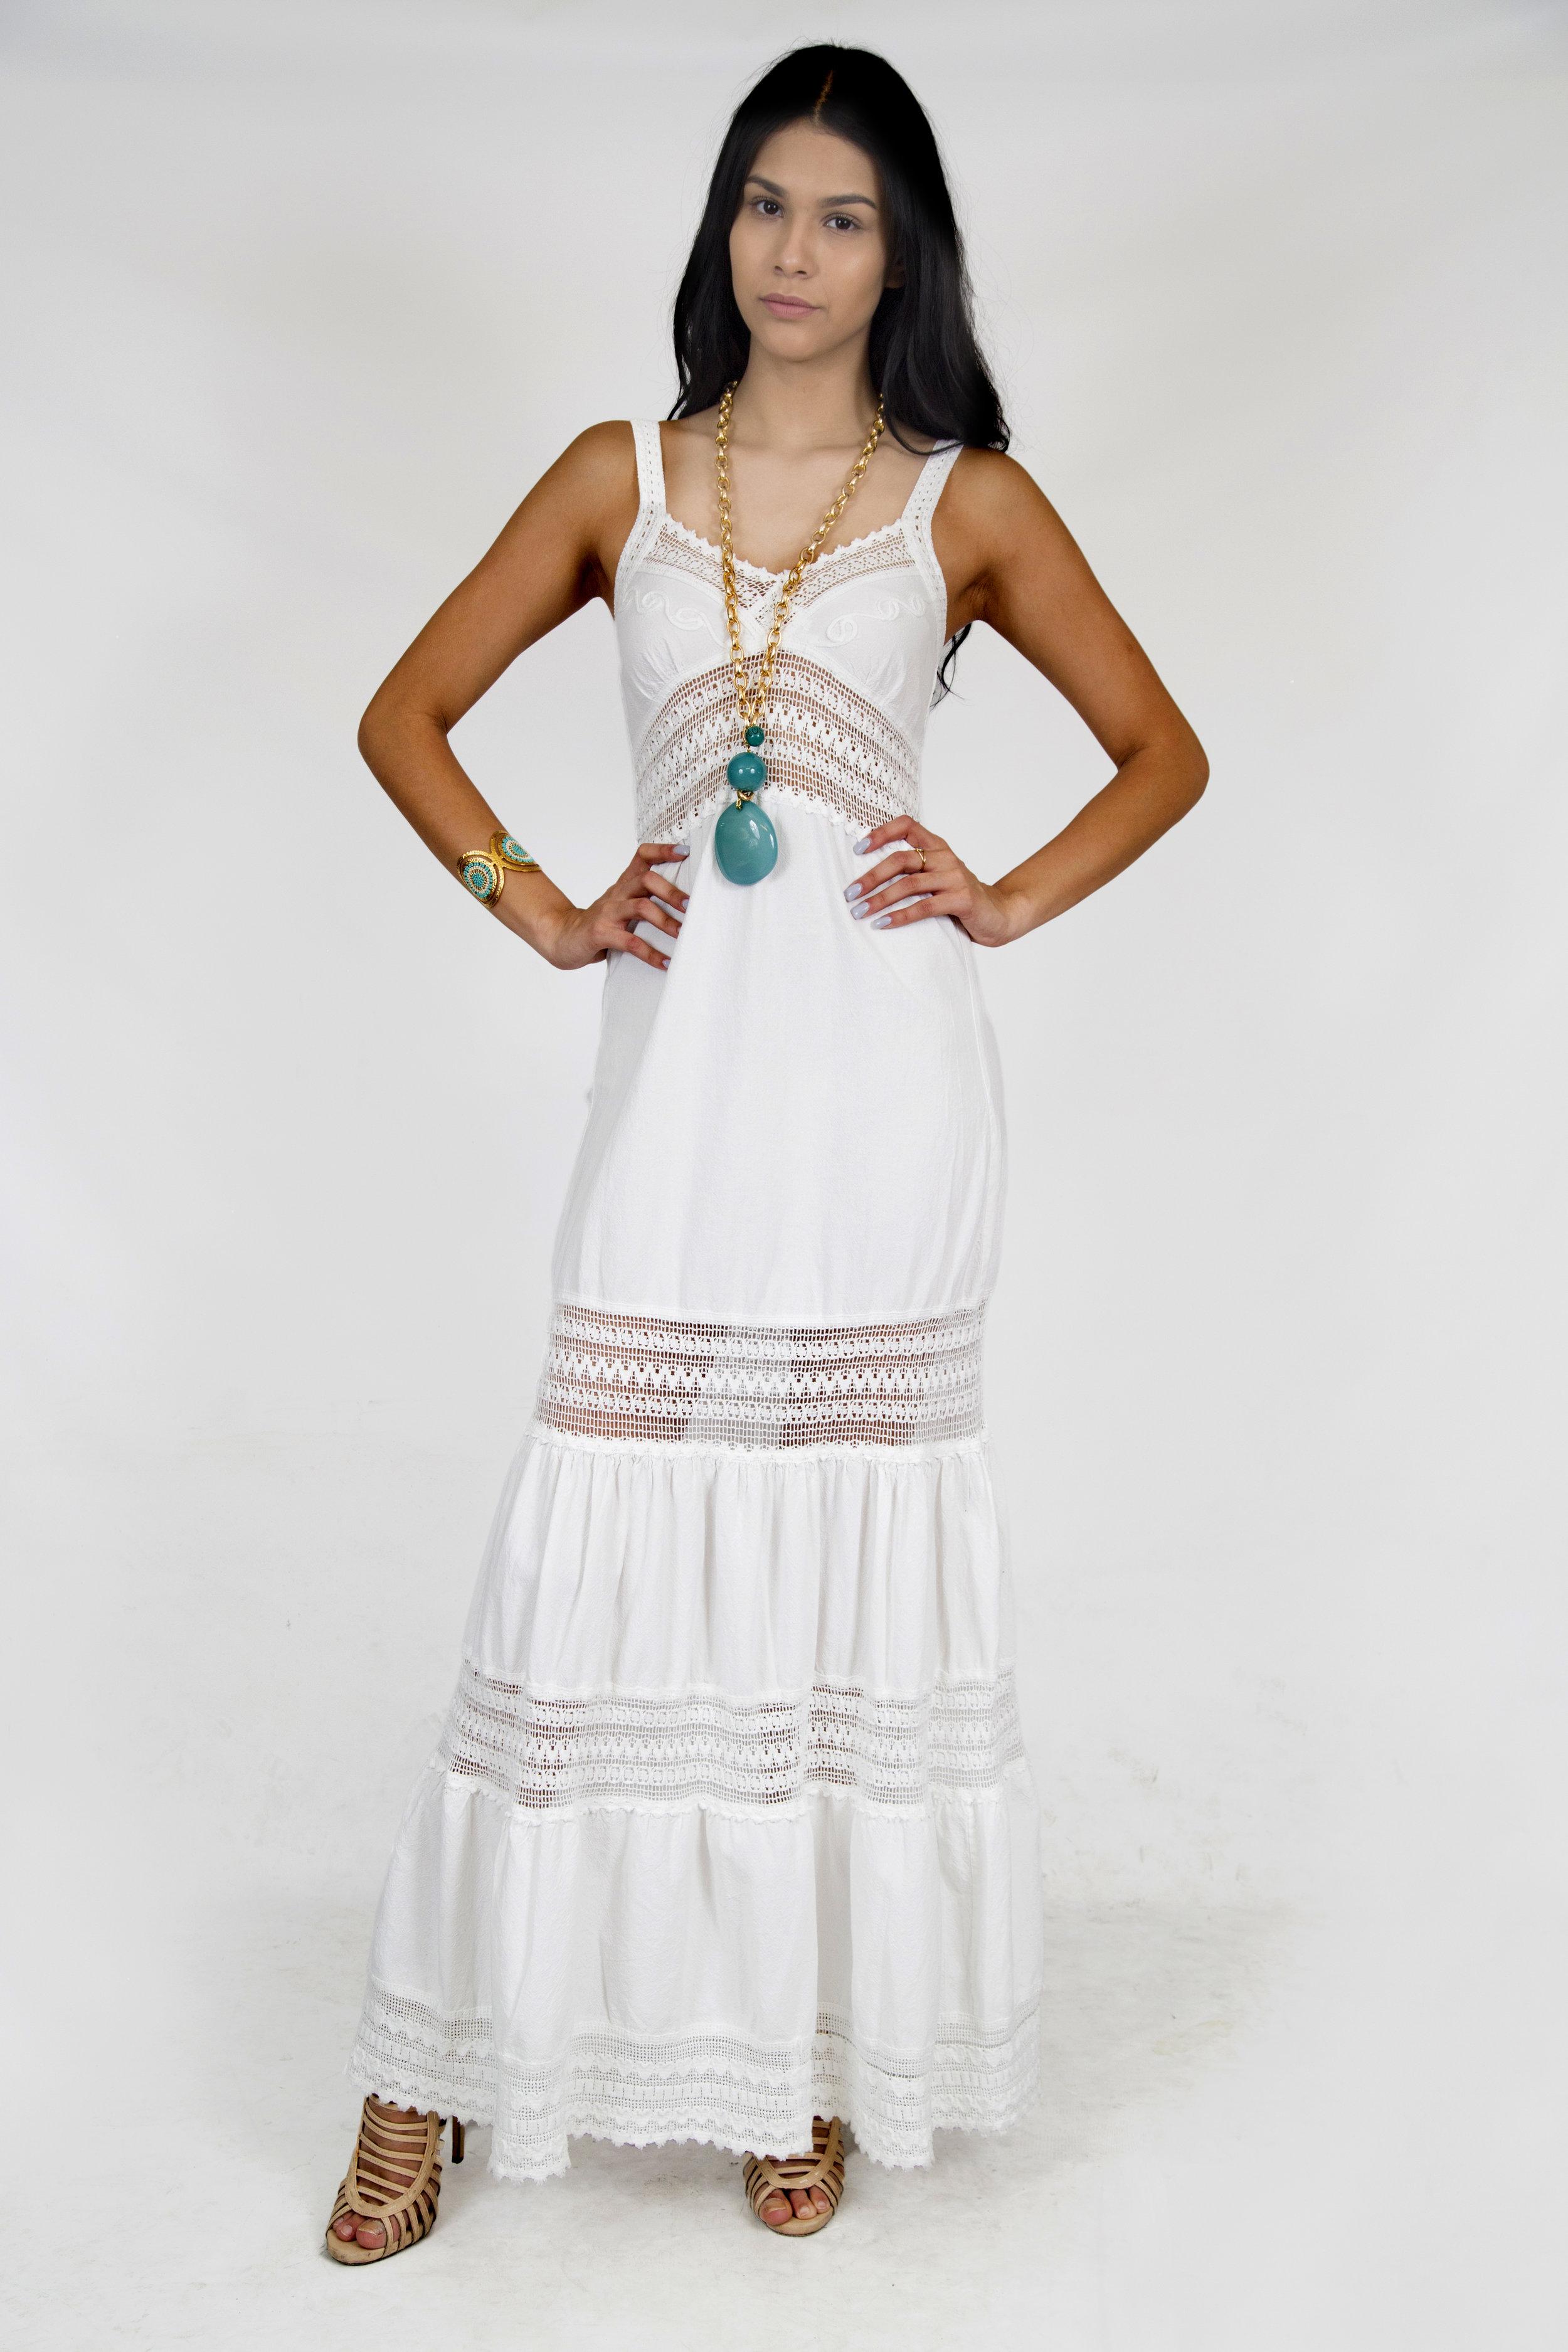 Summer Cotton Dress- Veronica - Shop on Ebay